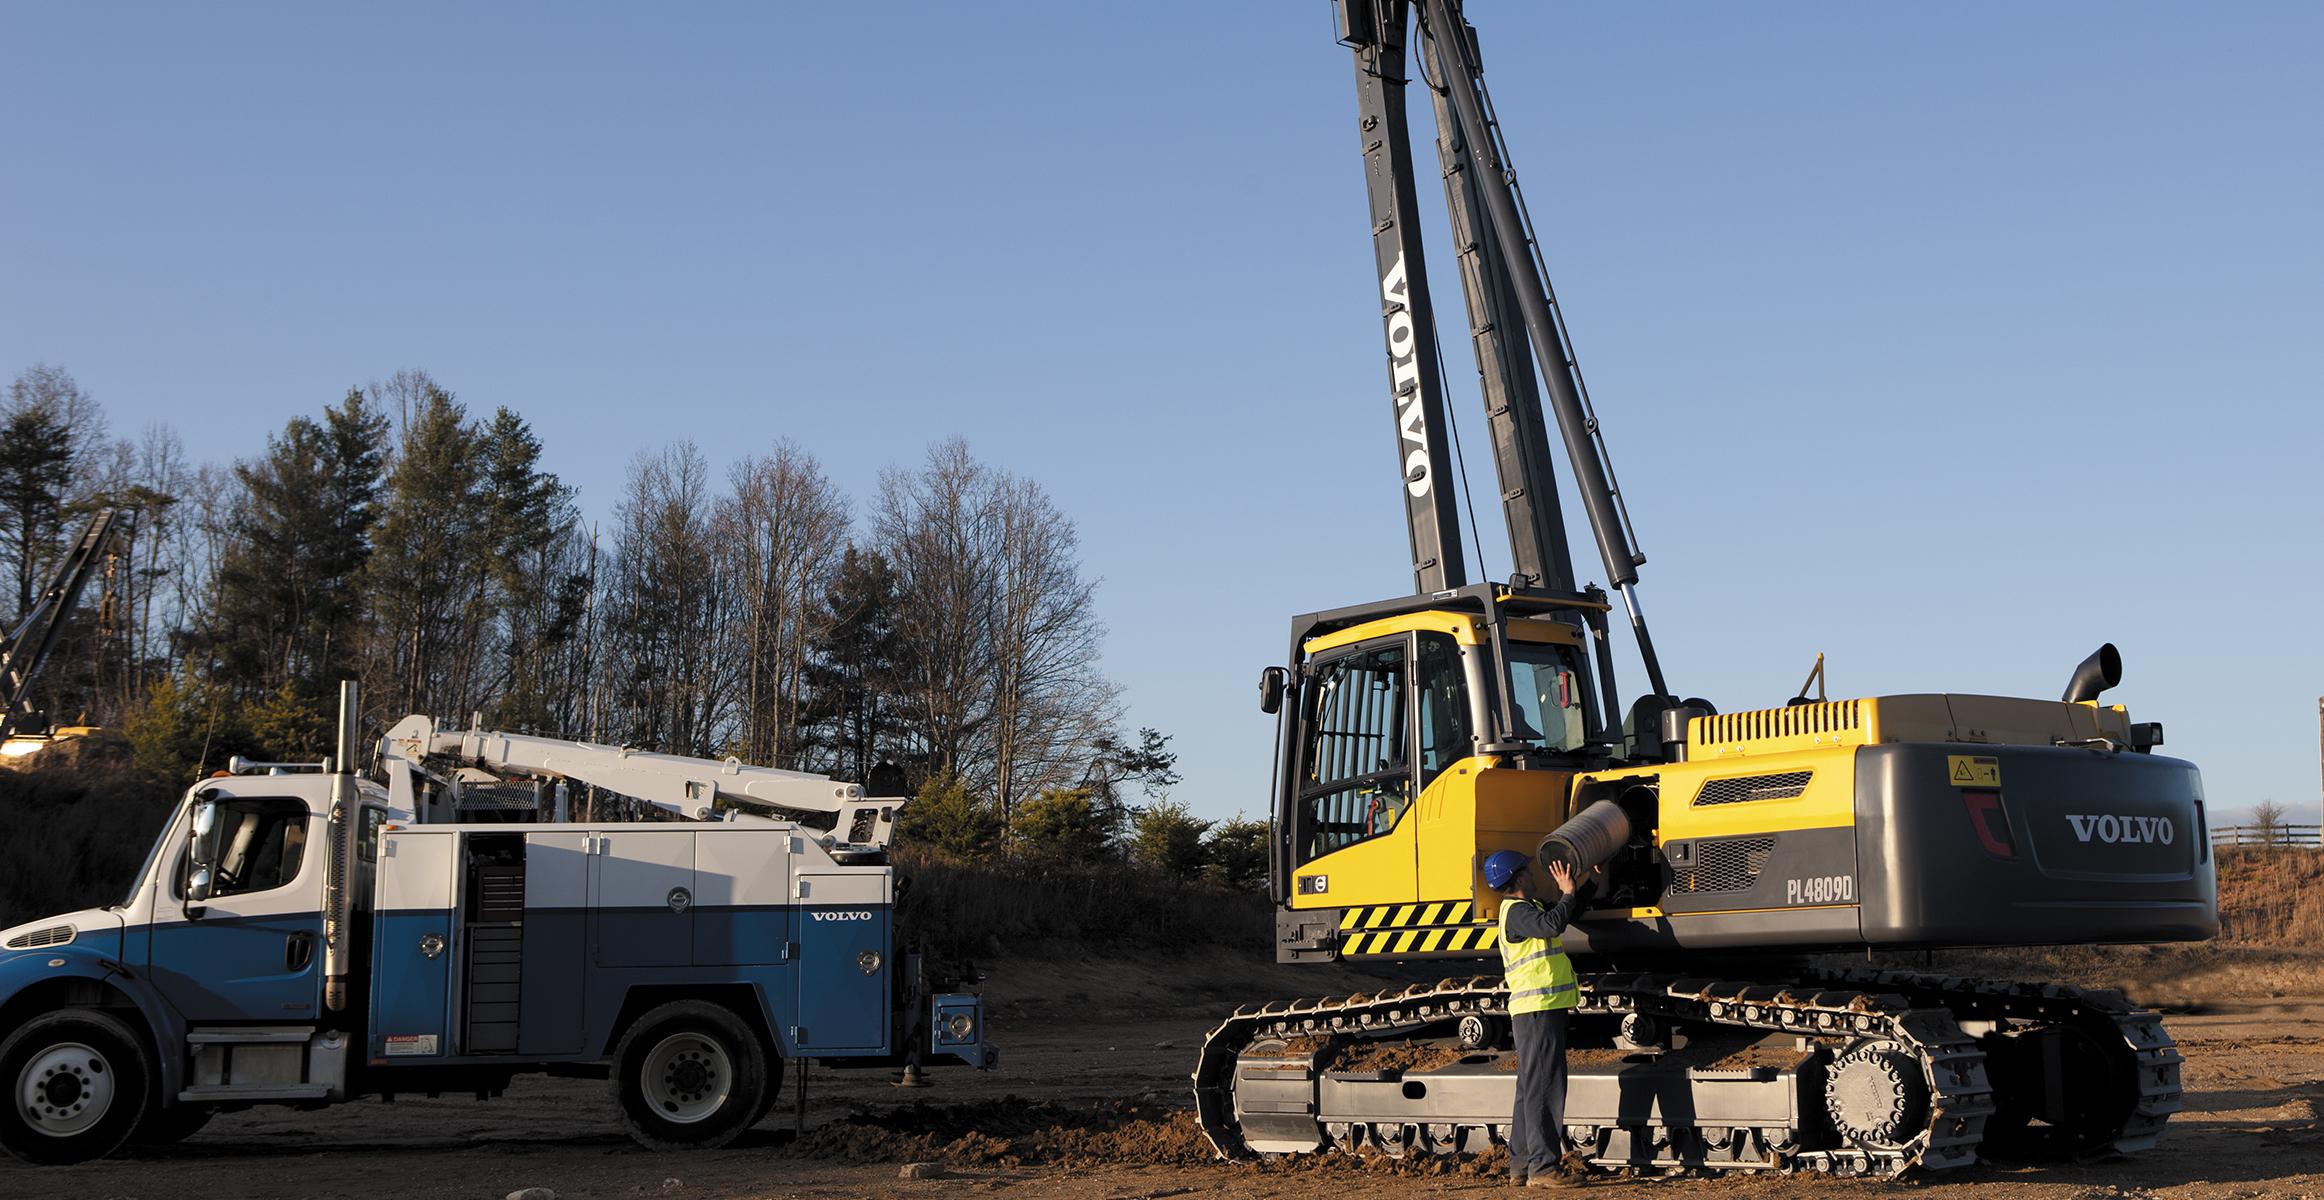 volvo pipeliner posatubi x condutture Volvo-benefits-pipelayer-pl4809d-t4i-serviceability-2324x1200